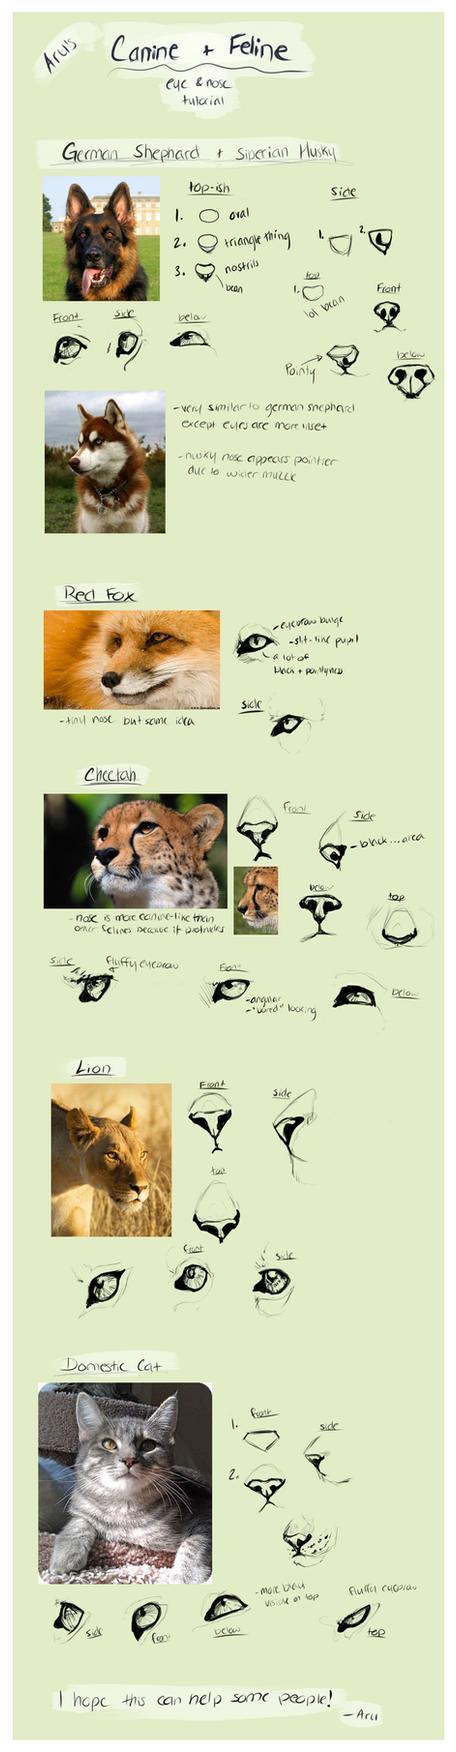 Canine and Feline, nose and eye Tut by SyerAru